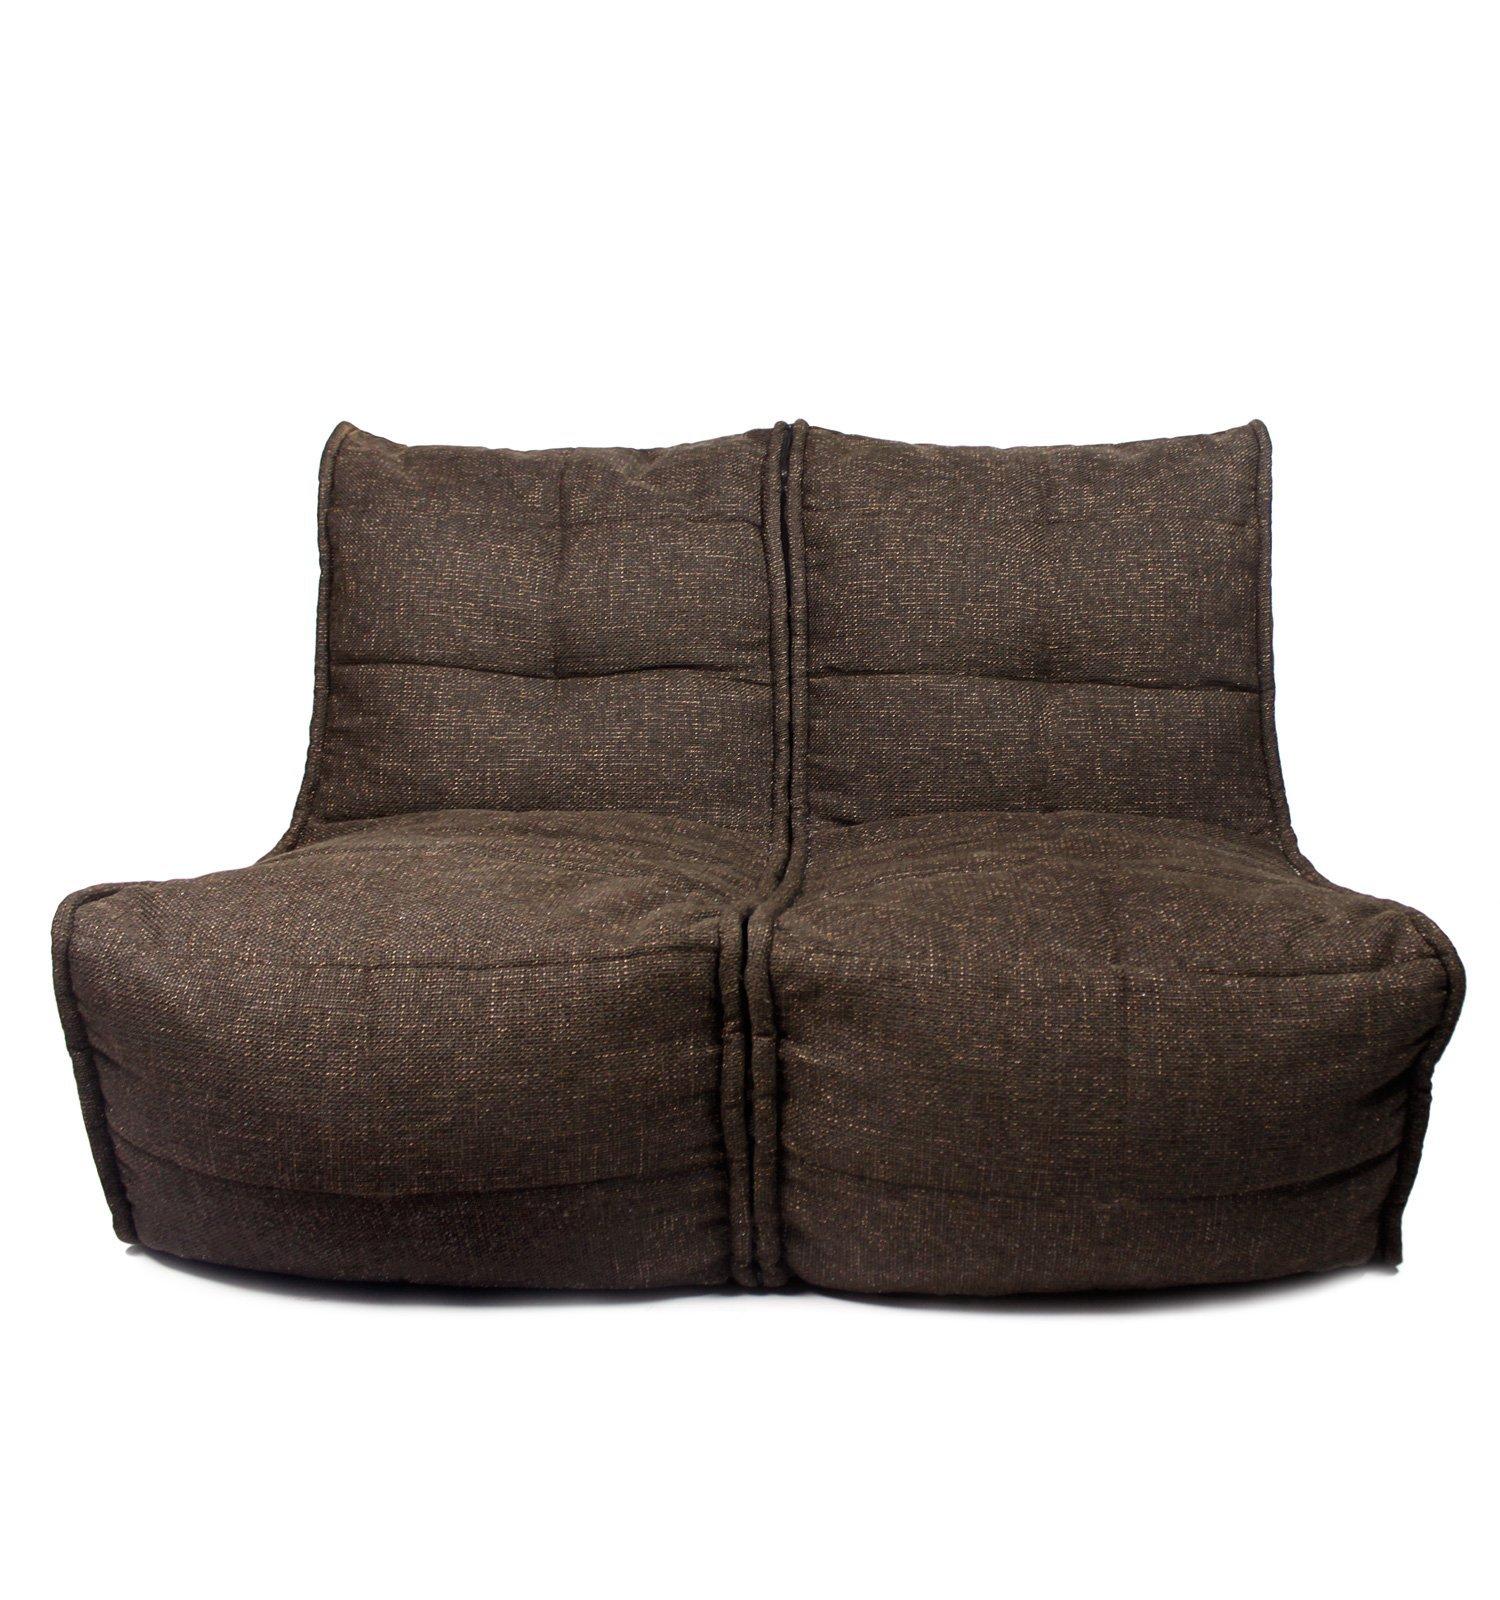 Full Size of Sitzsack Sofa Twin Hot Chocolate Ambientyou Mit Abnehmbaren Bezug 2 Sitzer Neu Beziehen Lassen Stoff Grau Polsterreiniger Langes Petrol Lagerverkauf Xxxl Sofa Sitzsack Sofa